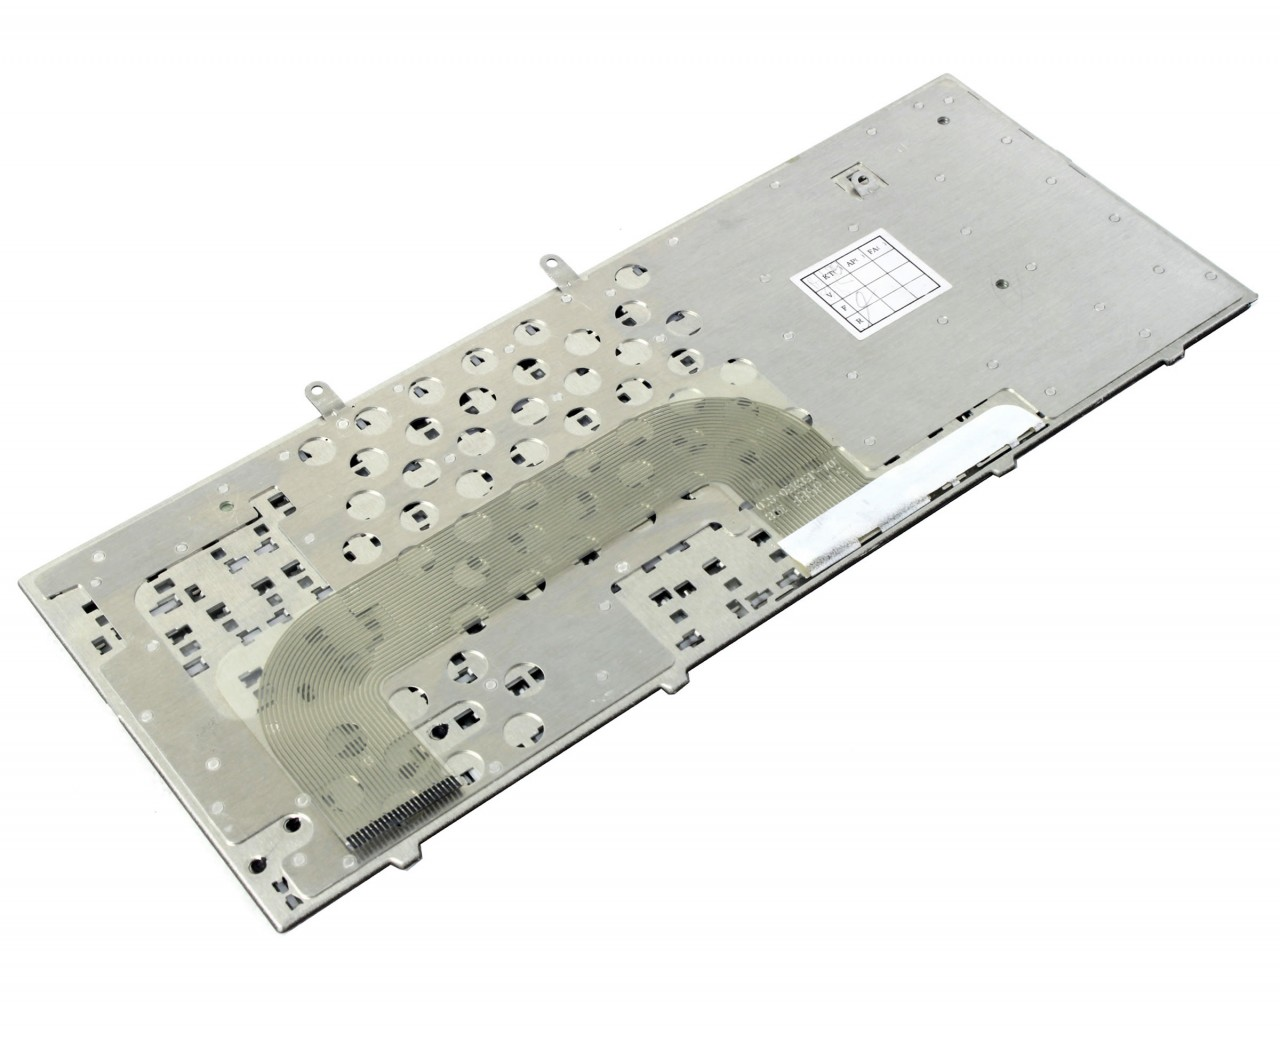 Tastatura HP Mini 110 1020 imagine powerlaptop.ro 2021